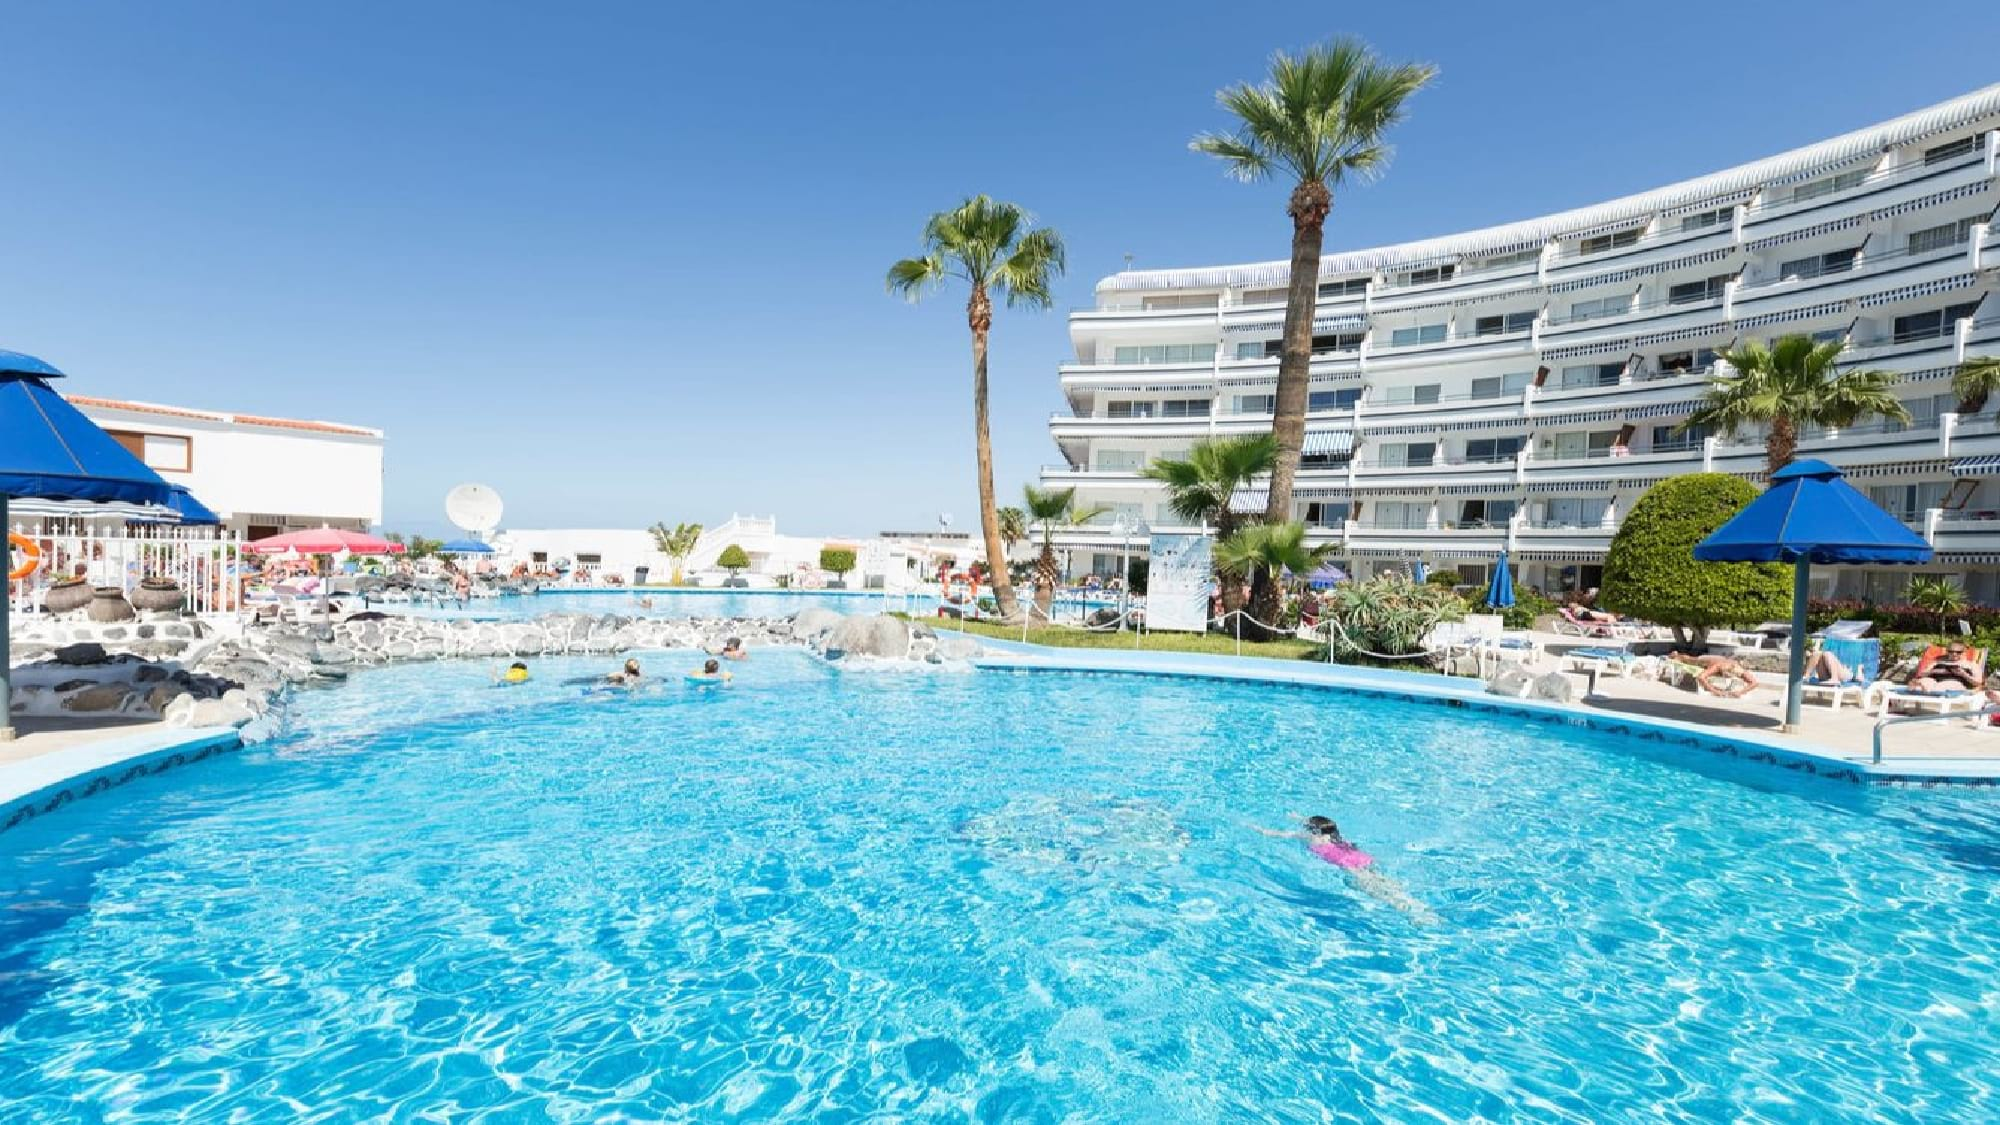 1 Bedroom Apartment in Tenerife for rent | Club Atlantis ...